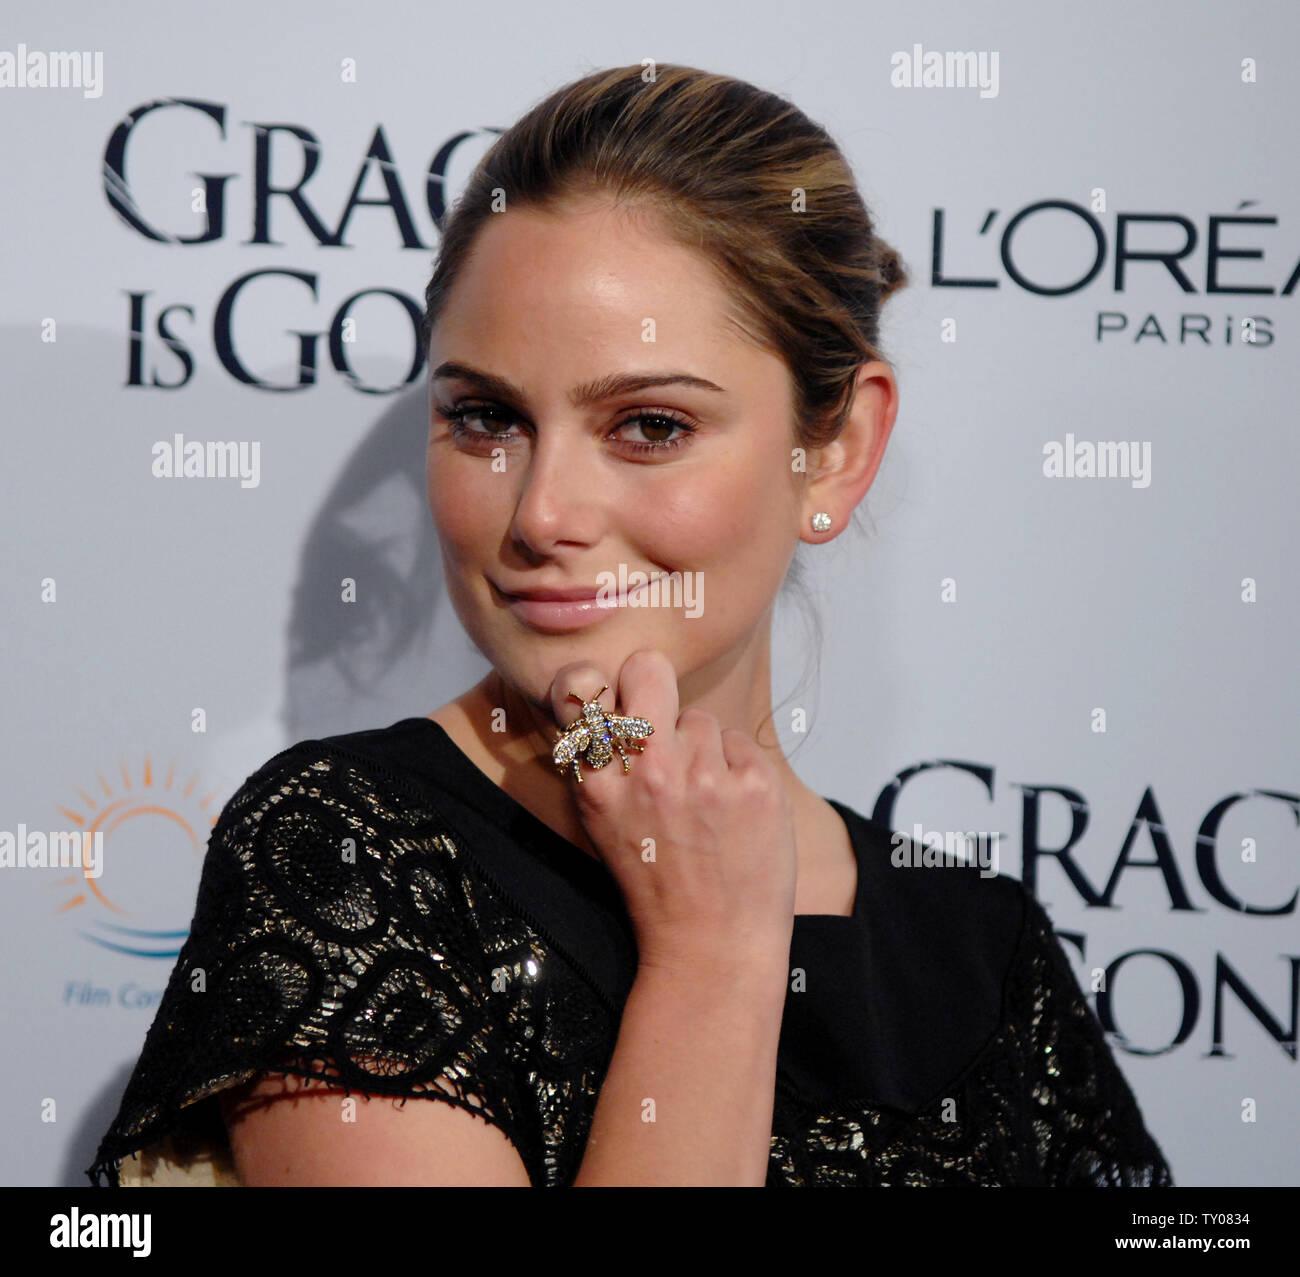 100 Images of Amanda Brooks Actress